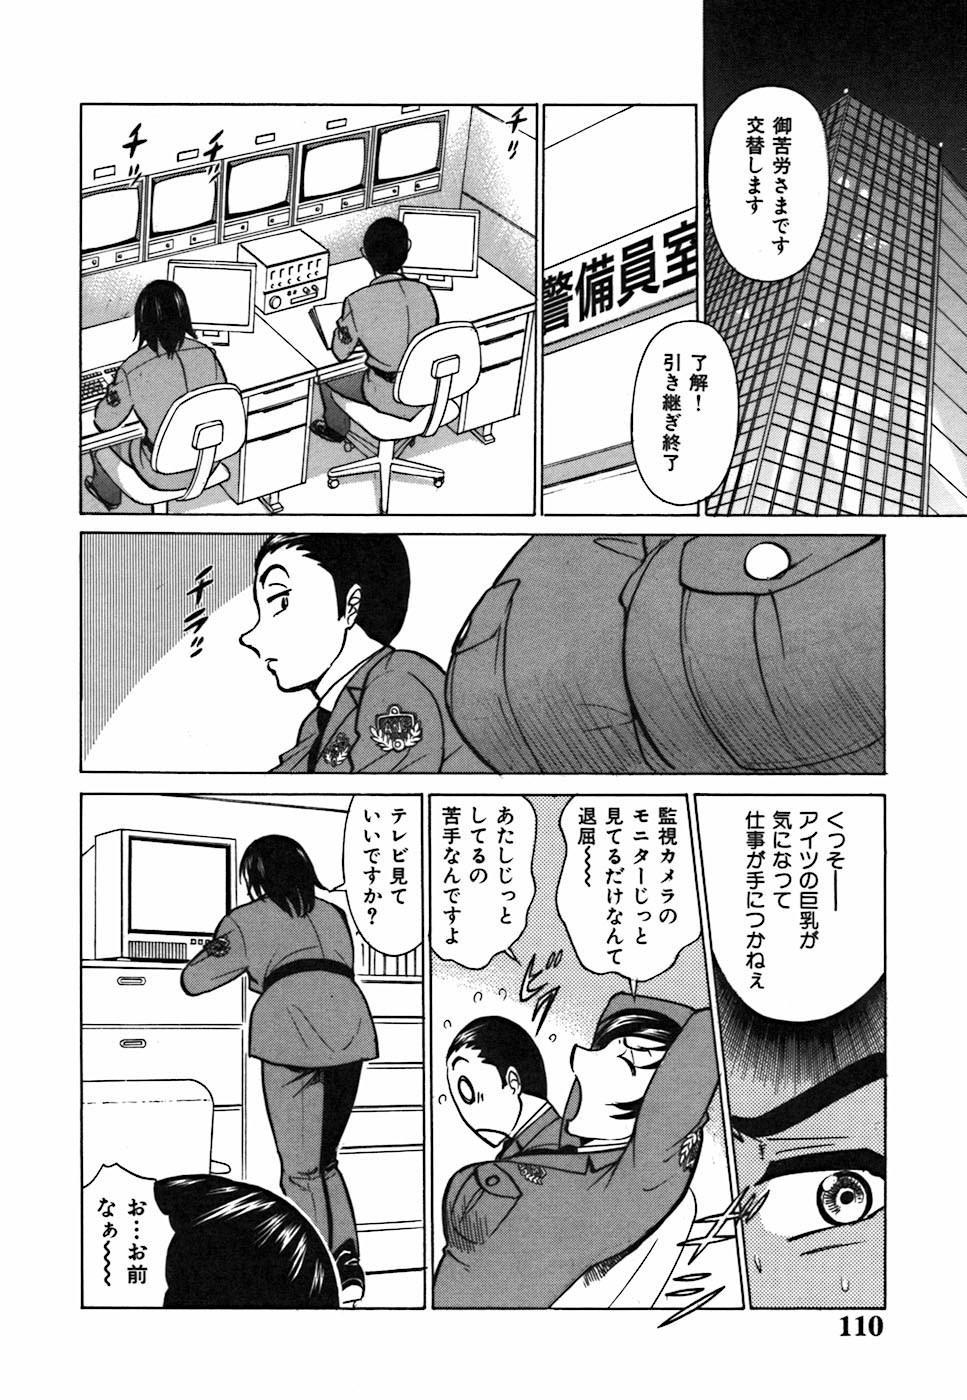 Kimi ga Nozomu Katachi | Appearance for which you hope 109